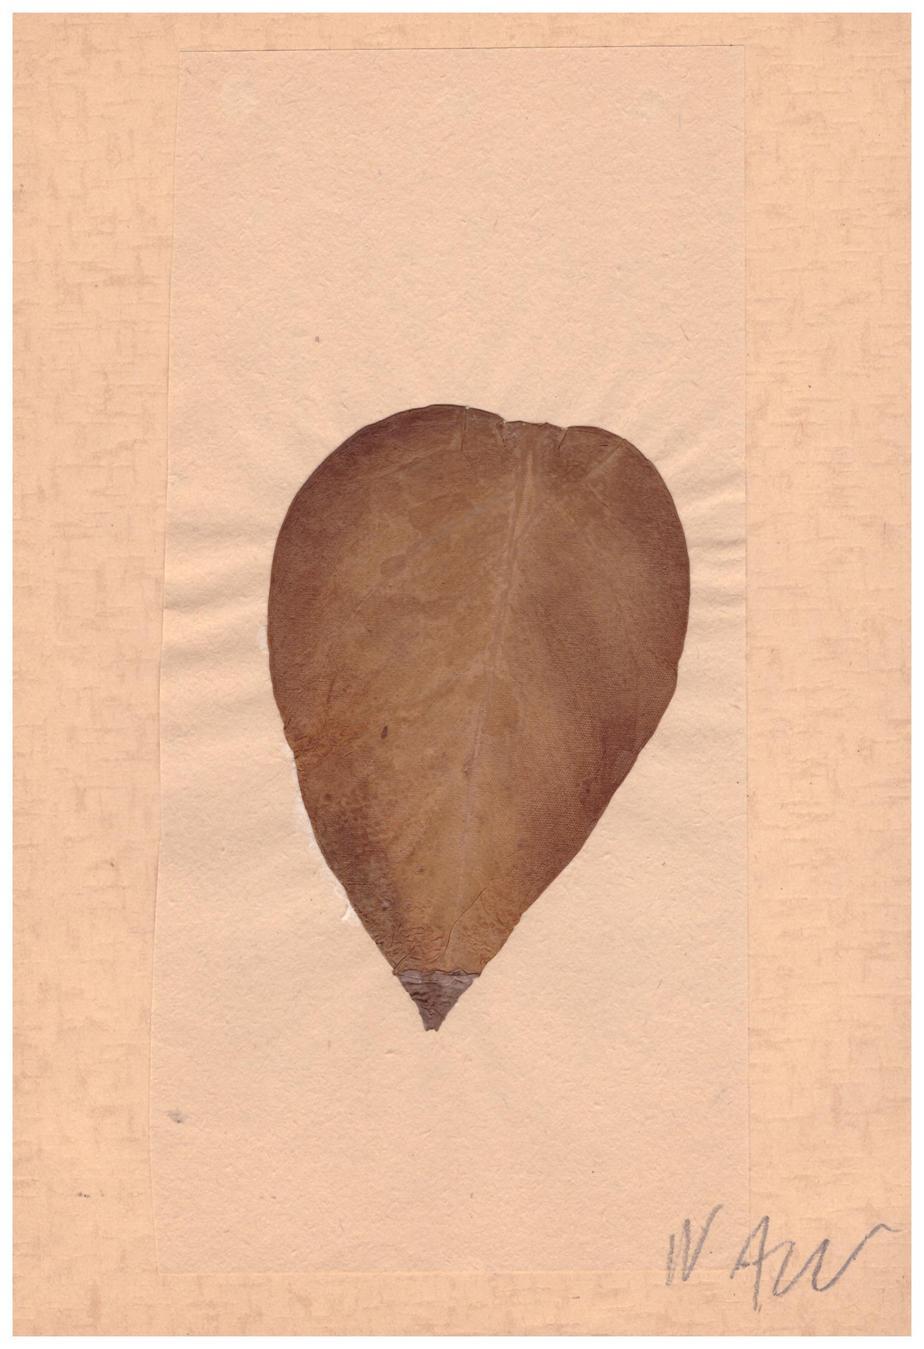 Nikos Alexiou Dried leaf, collage on paper 20.9 x 14.7 cm